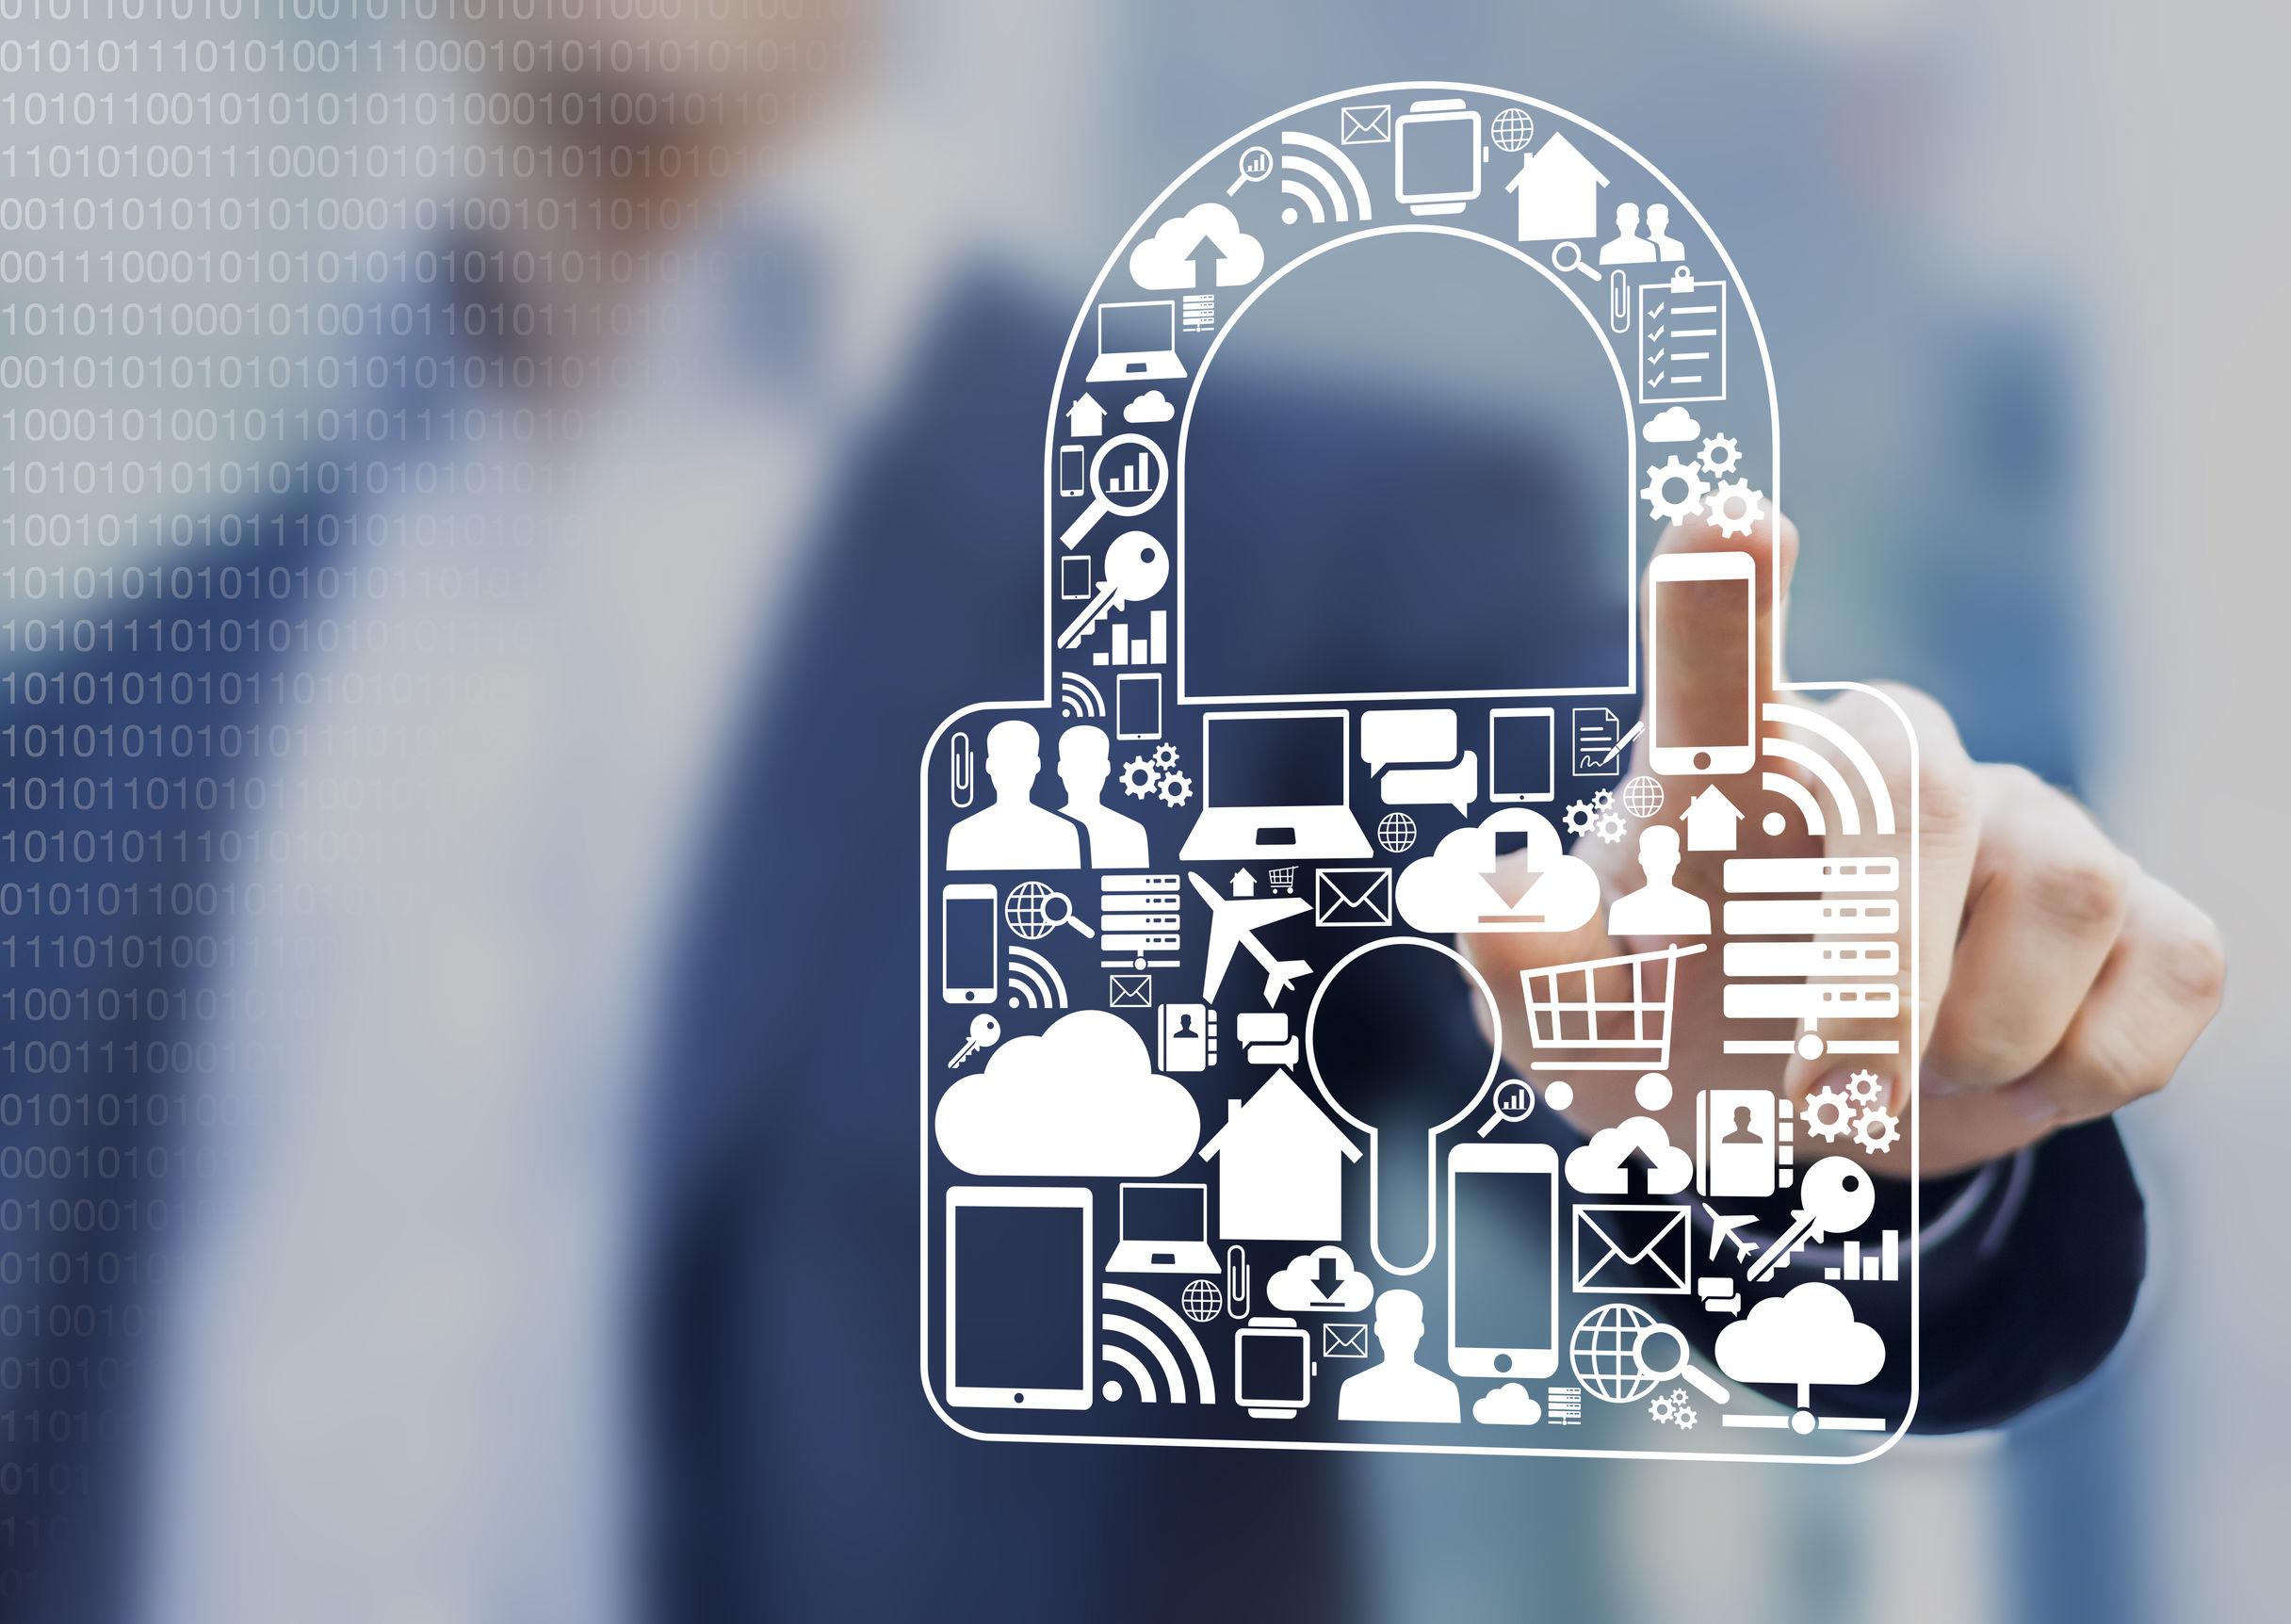 Bagaimana Cara Menyimpan Server Key dengan Aman